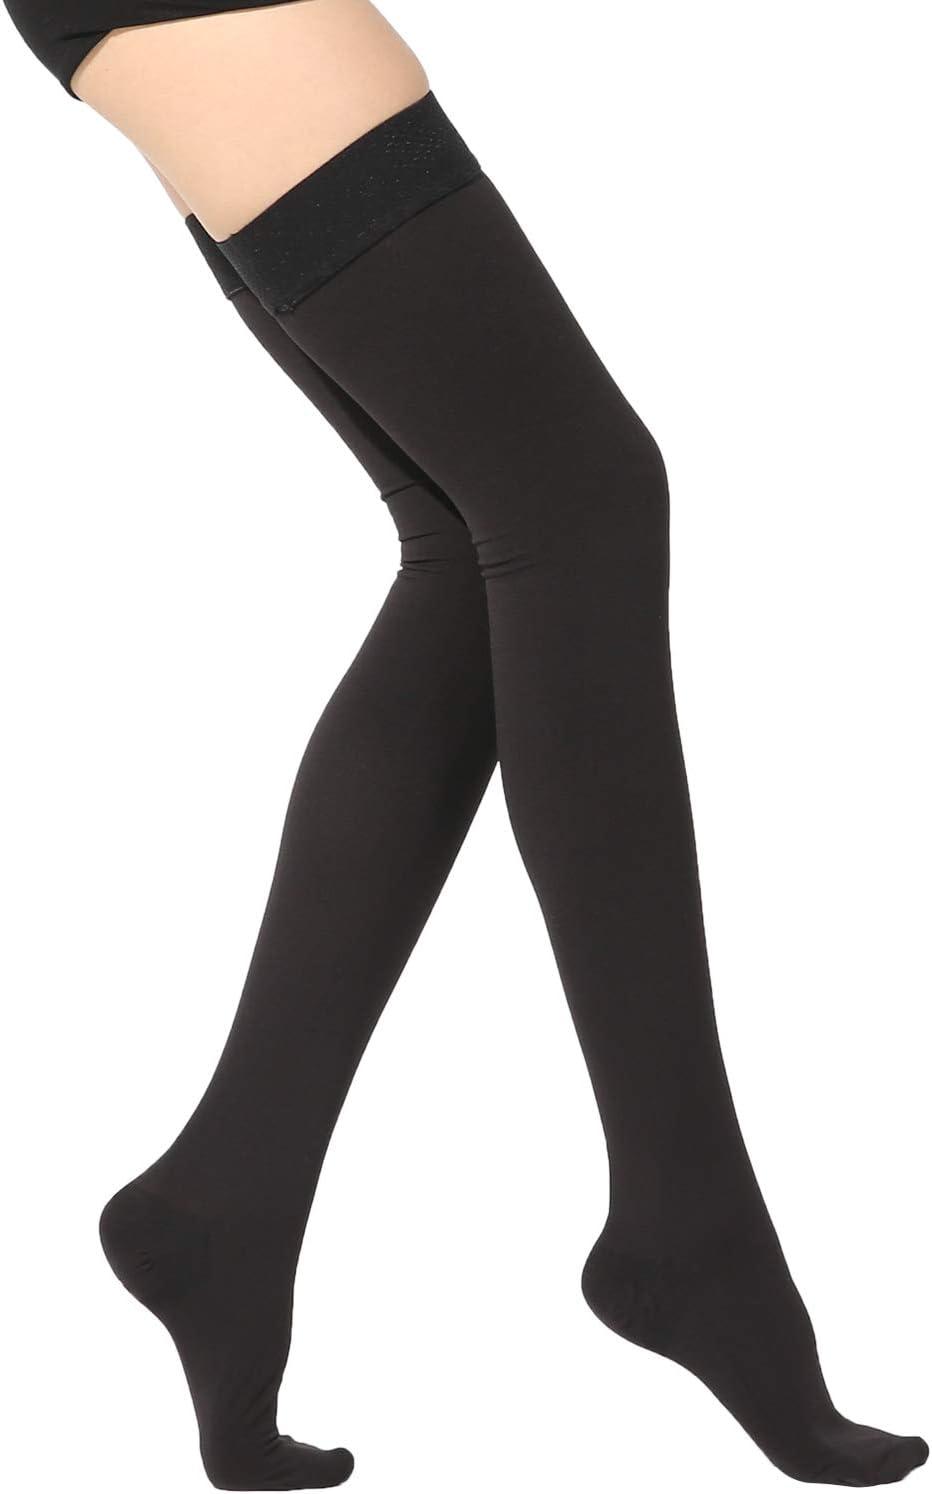 30-40 mmHg Ztl Thigh High Compression Stockings Women Men Open Toe